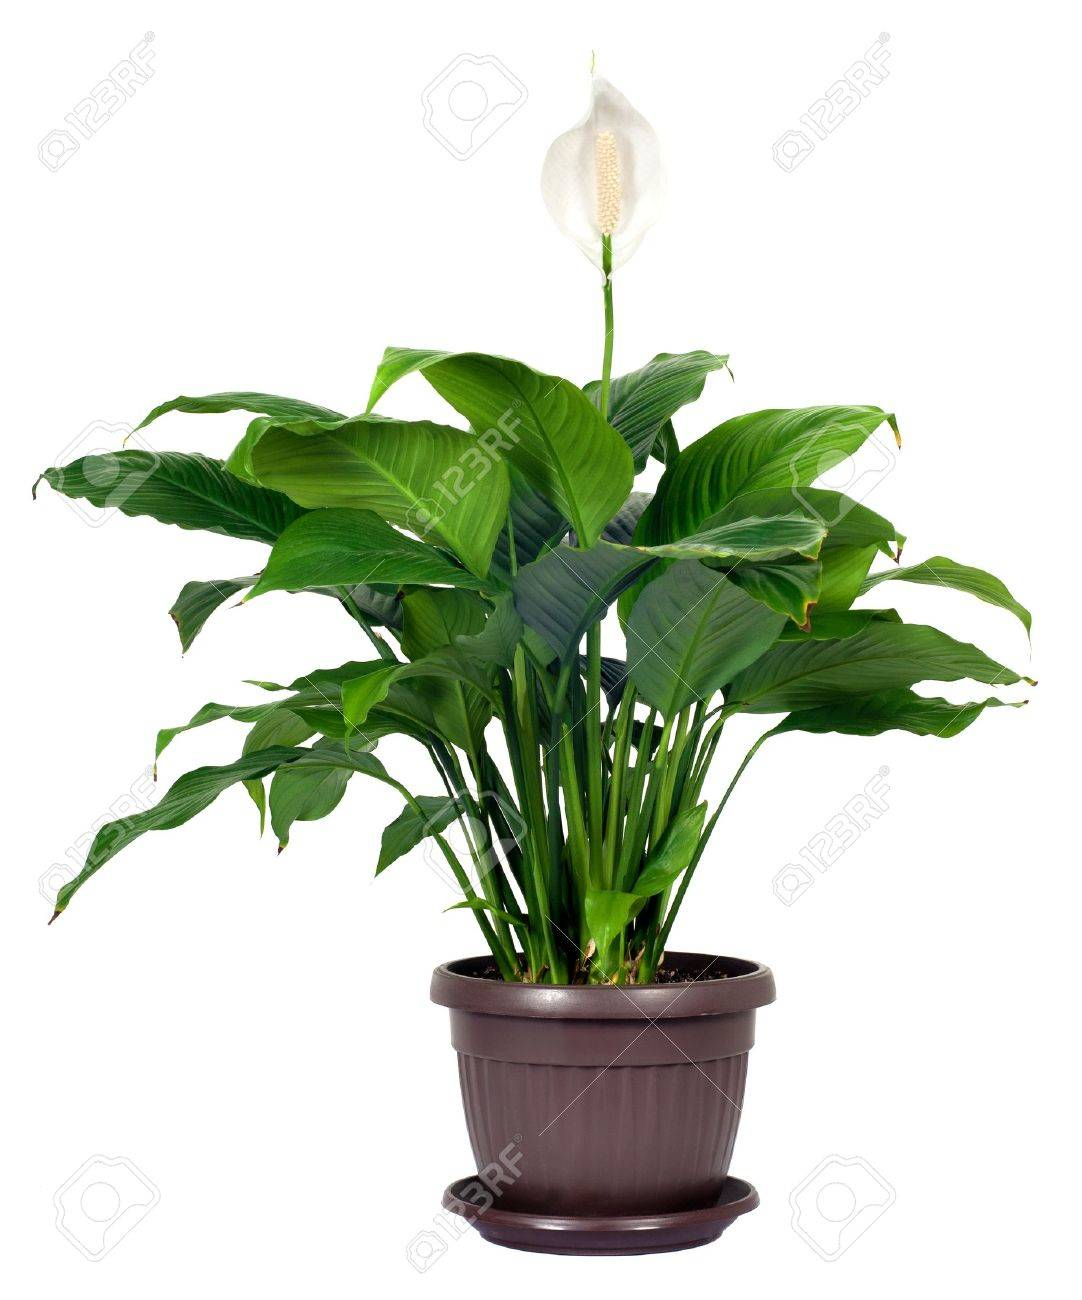 Houseplant spathiphyllum floribundum peace lily white flower houseplant spathiphyllum floribundum peace lily white flower isolated on white background stock photo 13292454 izmirmasajfo Gallery